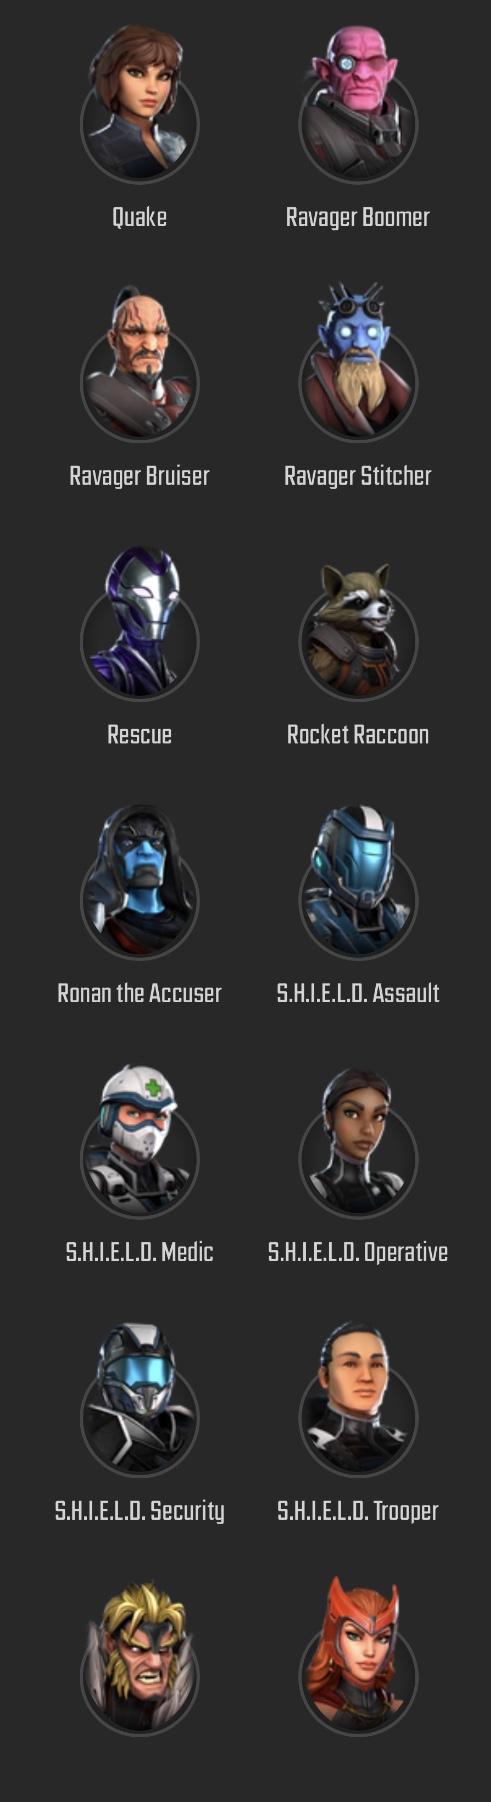 Marvel Strike Force: AKA Star Wars Galaxy of (Marvel) Heroes - The